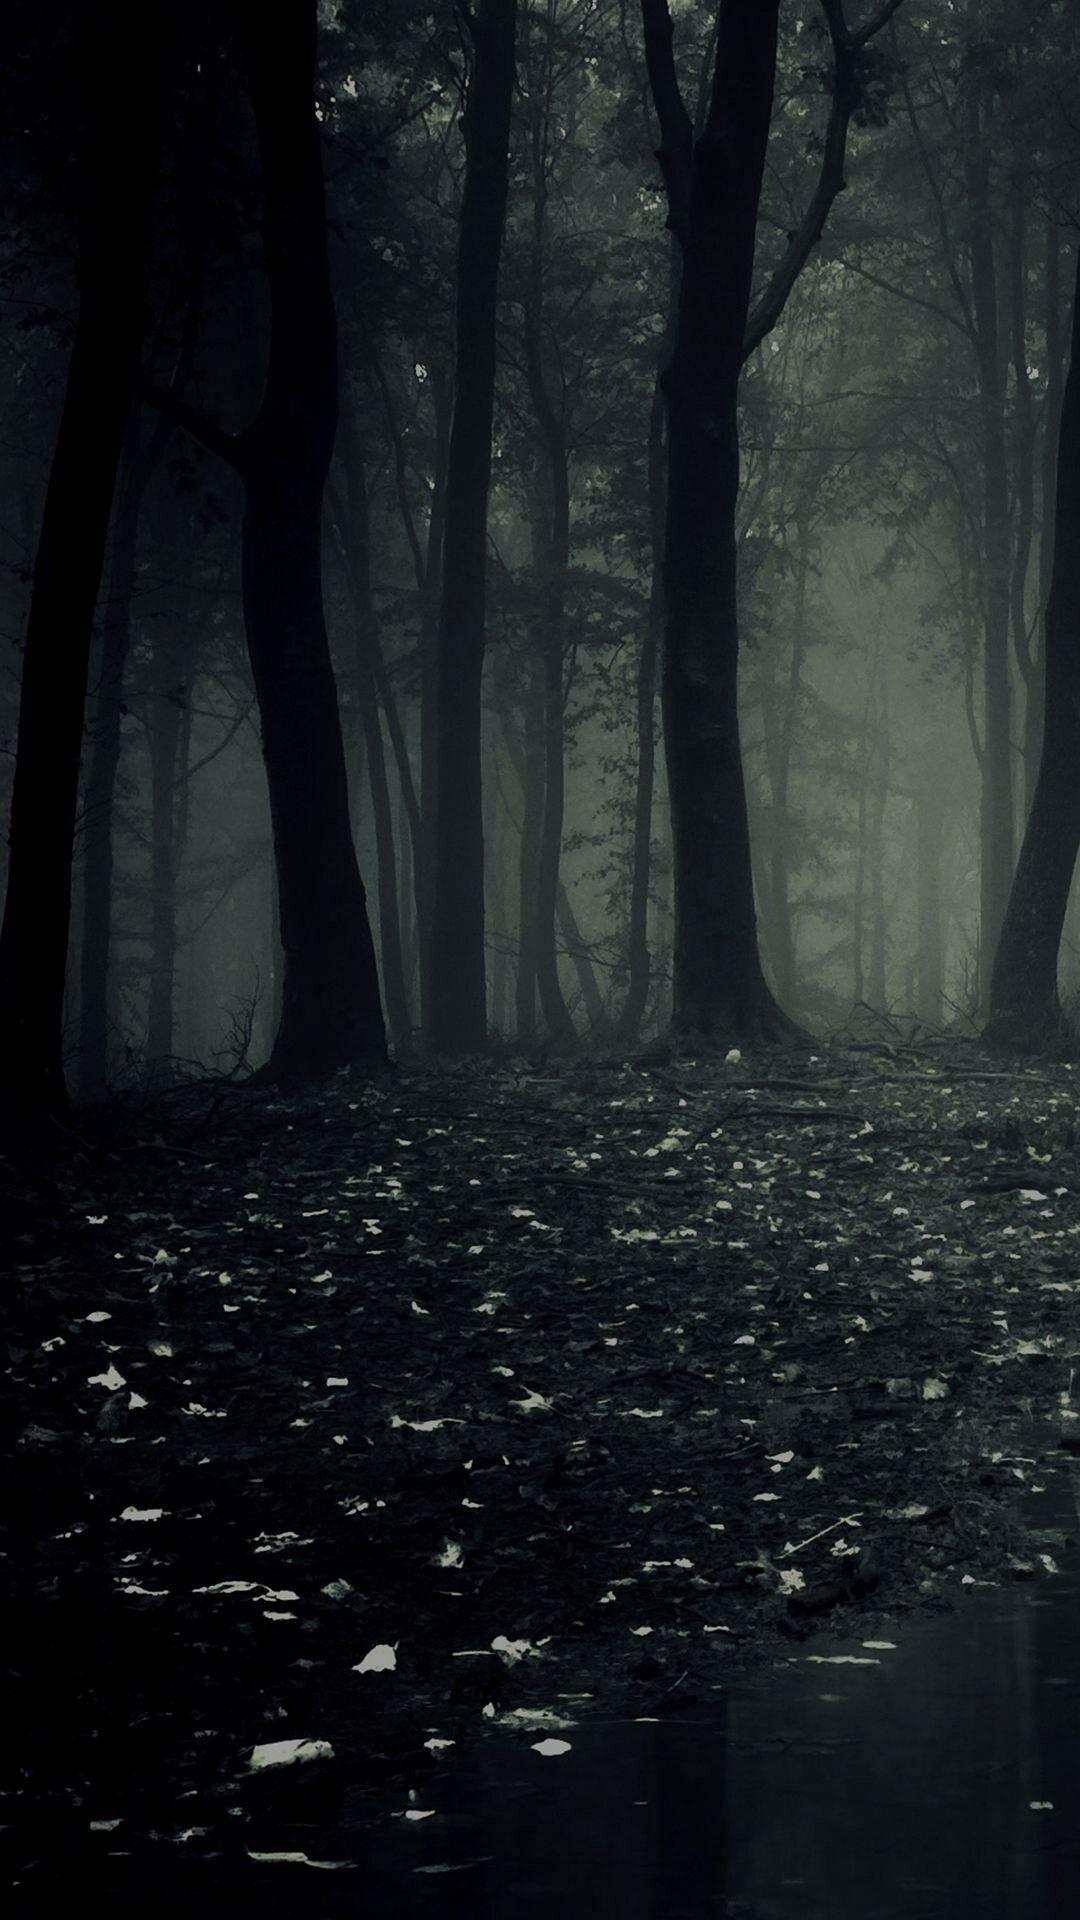 خلفيات طبيعة Nature عالية الوضوح Dark Forest غابات غابة غامق 35 Imagenes De Paisajes Animados Fotografia Creativa Fondos De Pantalla Black